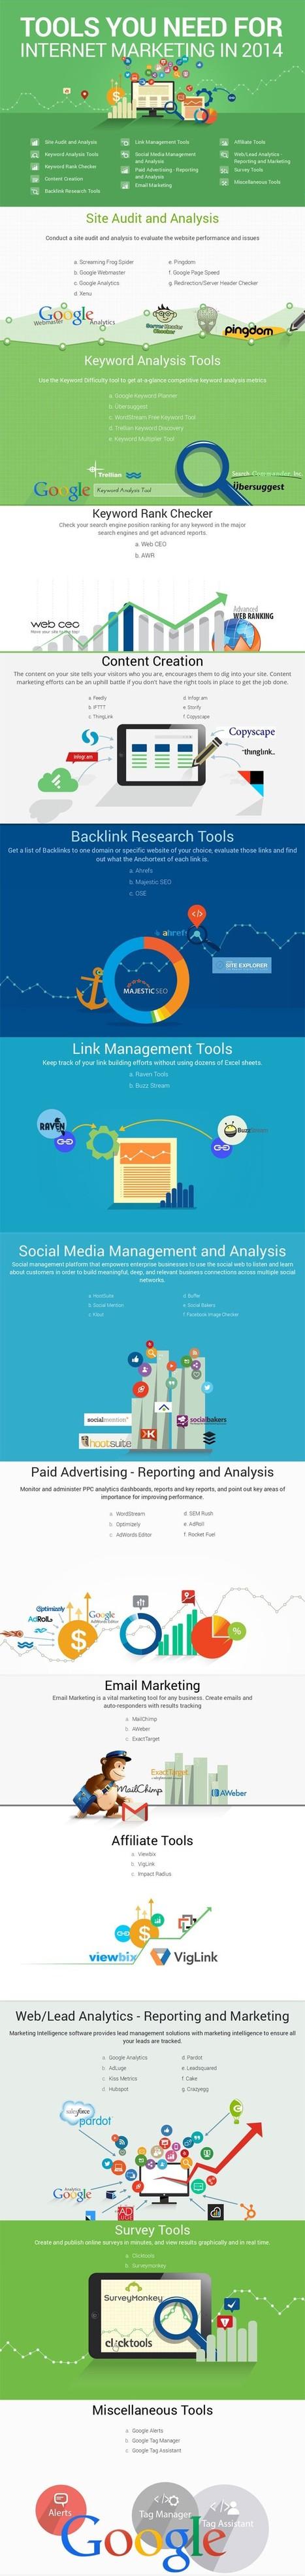 Herramientas que necesitas para el marketing online | Anairas | infografias - infographics | Scoop.it